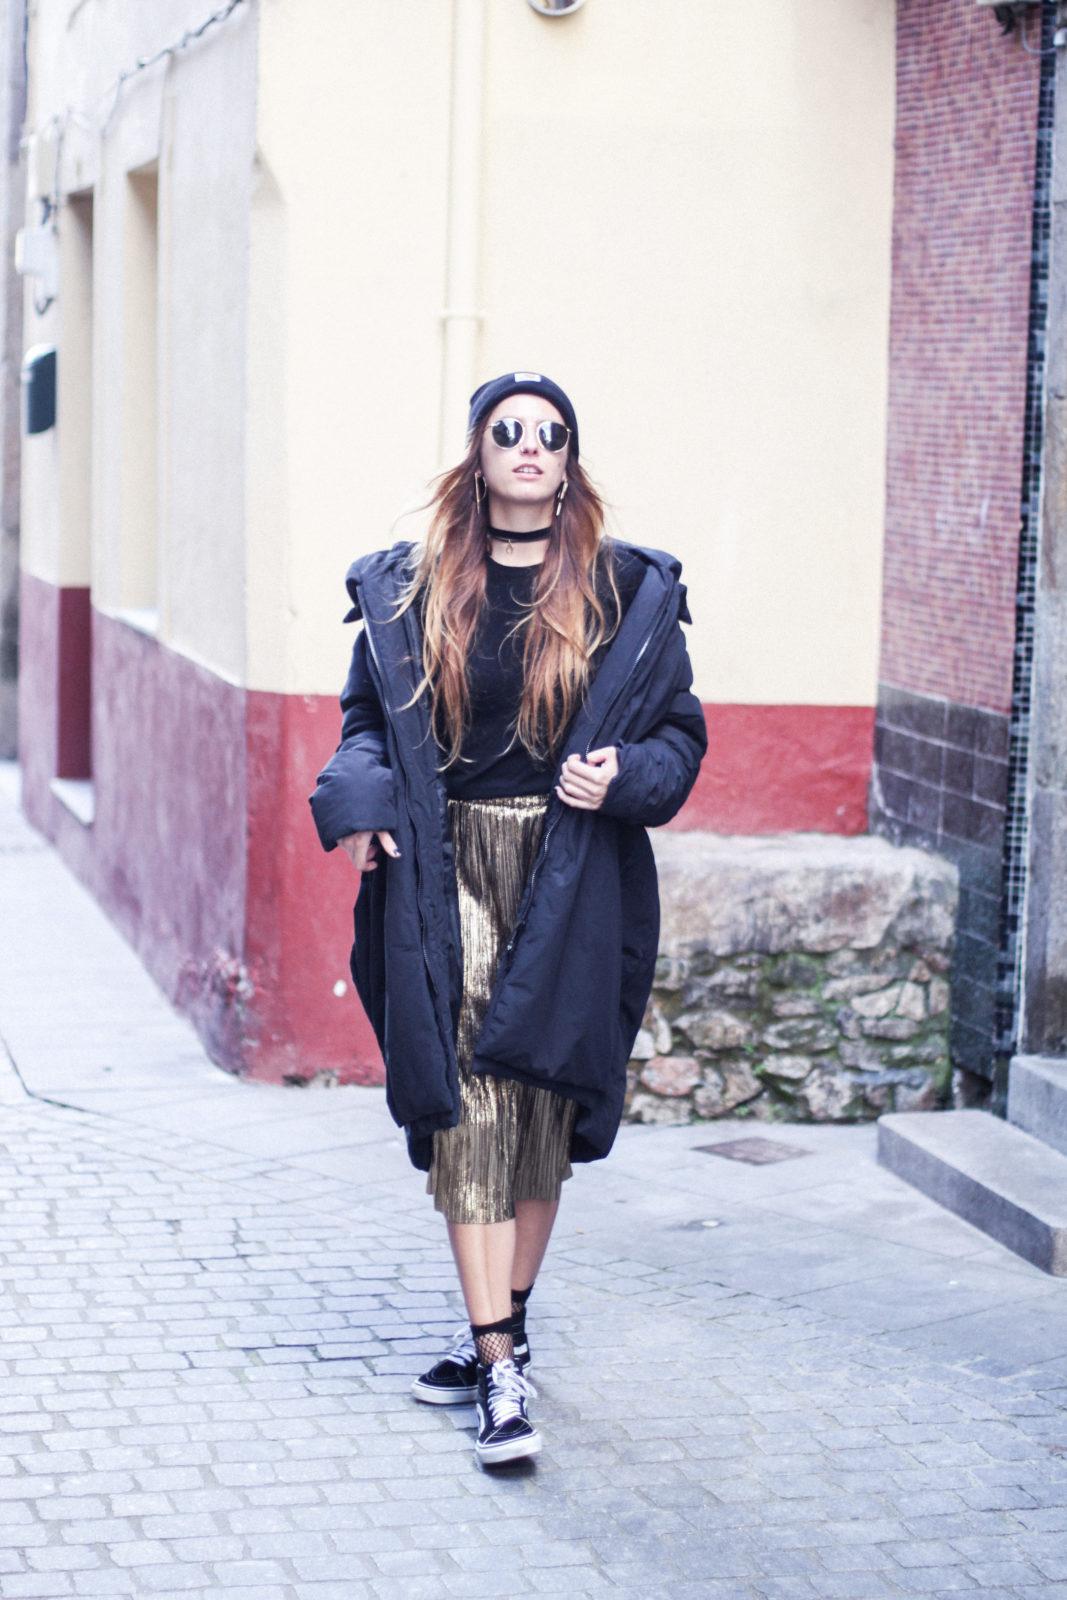 puffer_coat_plumifero_maxi_abrigo_calcetines_rejilla_falda_midi_metalizados_beanie_choker_vans-2